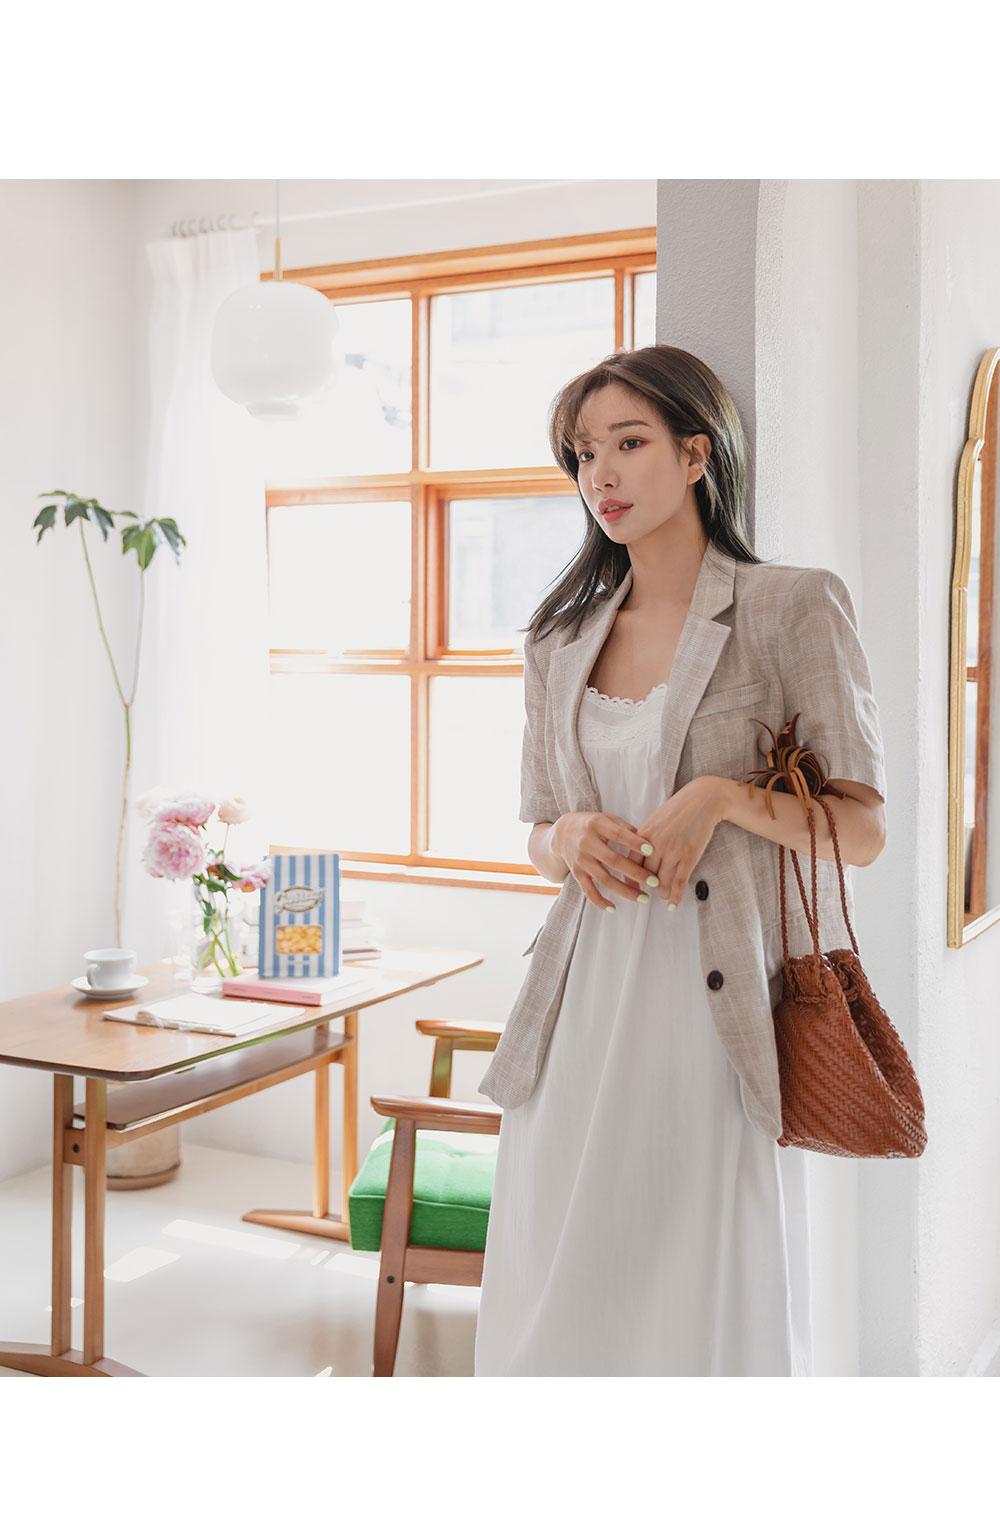 Monet Check Linen Short Sleeve Jacket